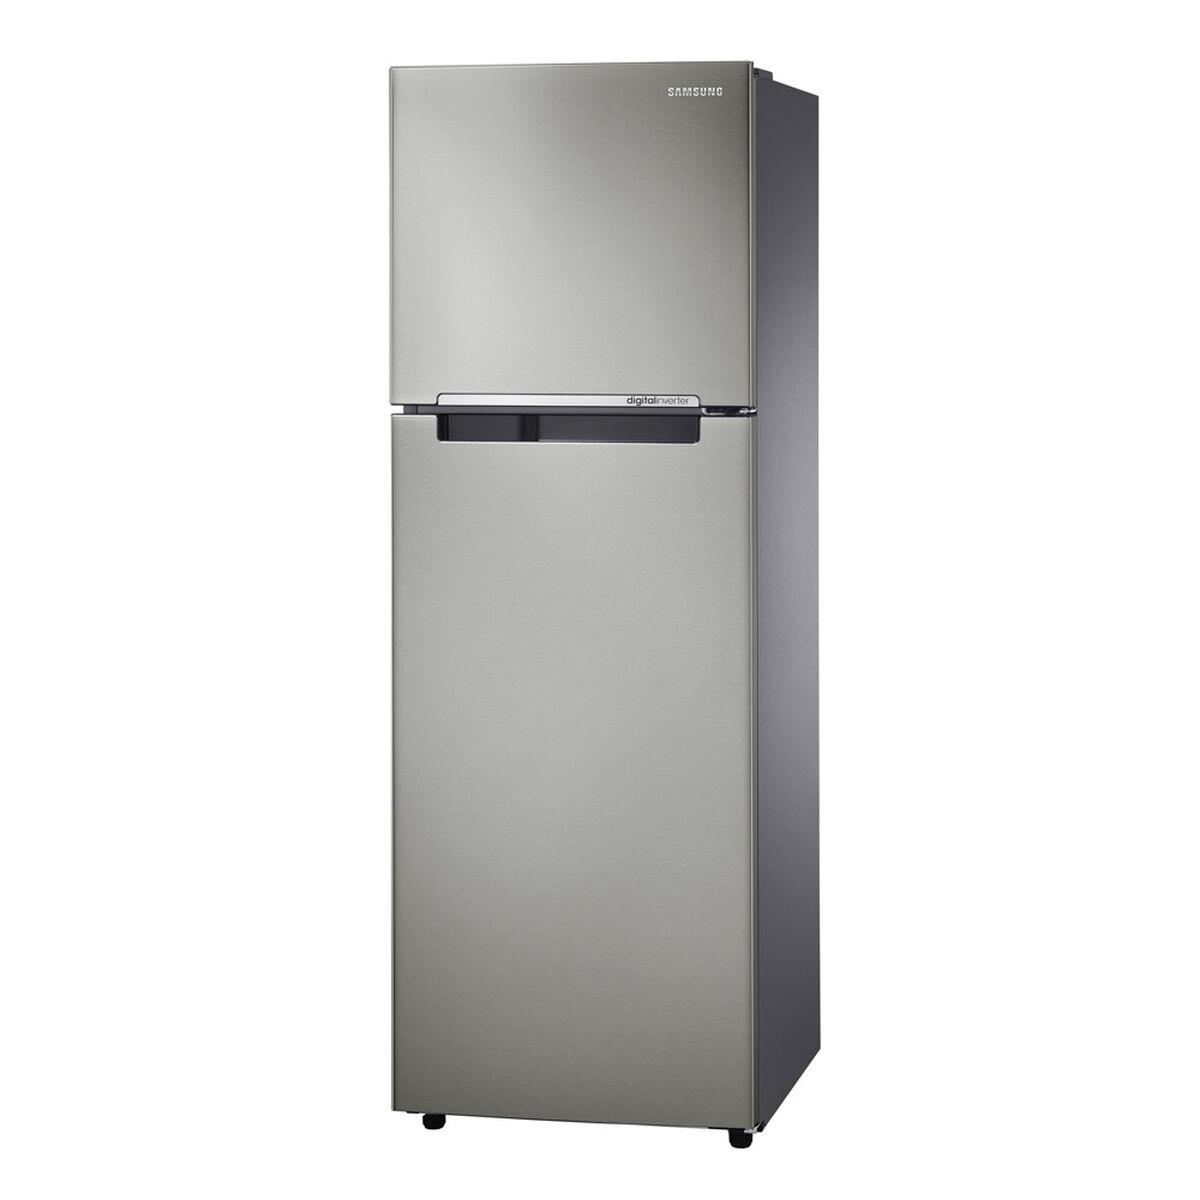 Refrigerador No Frost Samsung RT25FARADSP/ZS 261 lt.